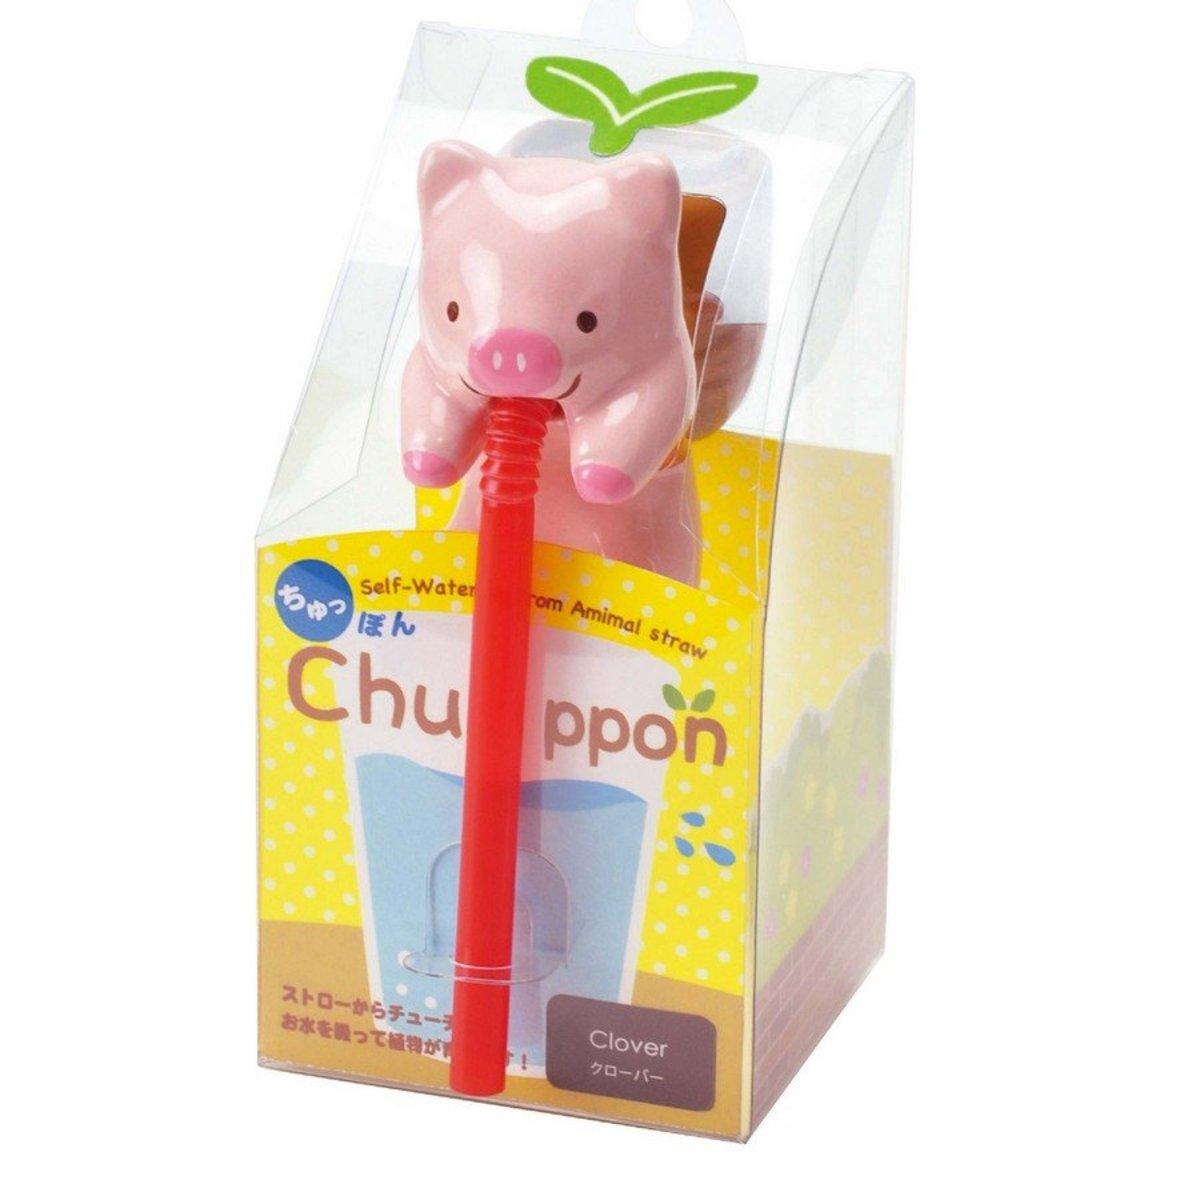 Chuppon 飲管吸水自種系列 - 小豬 (四葉草)